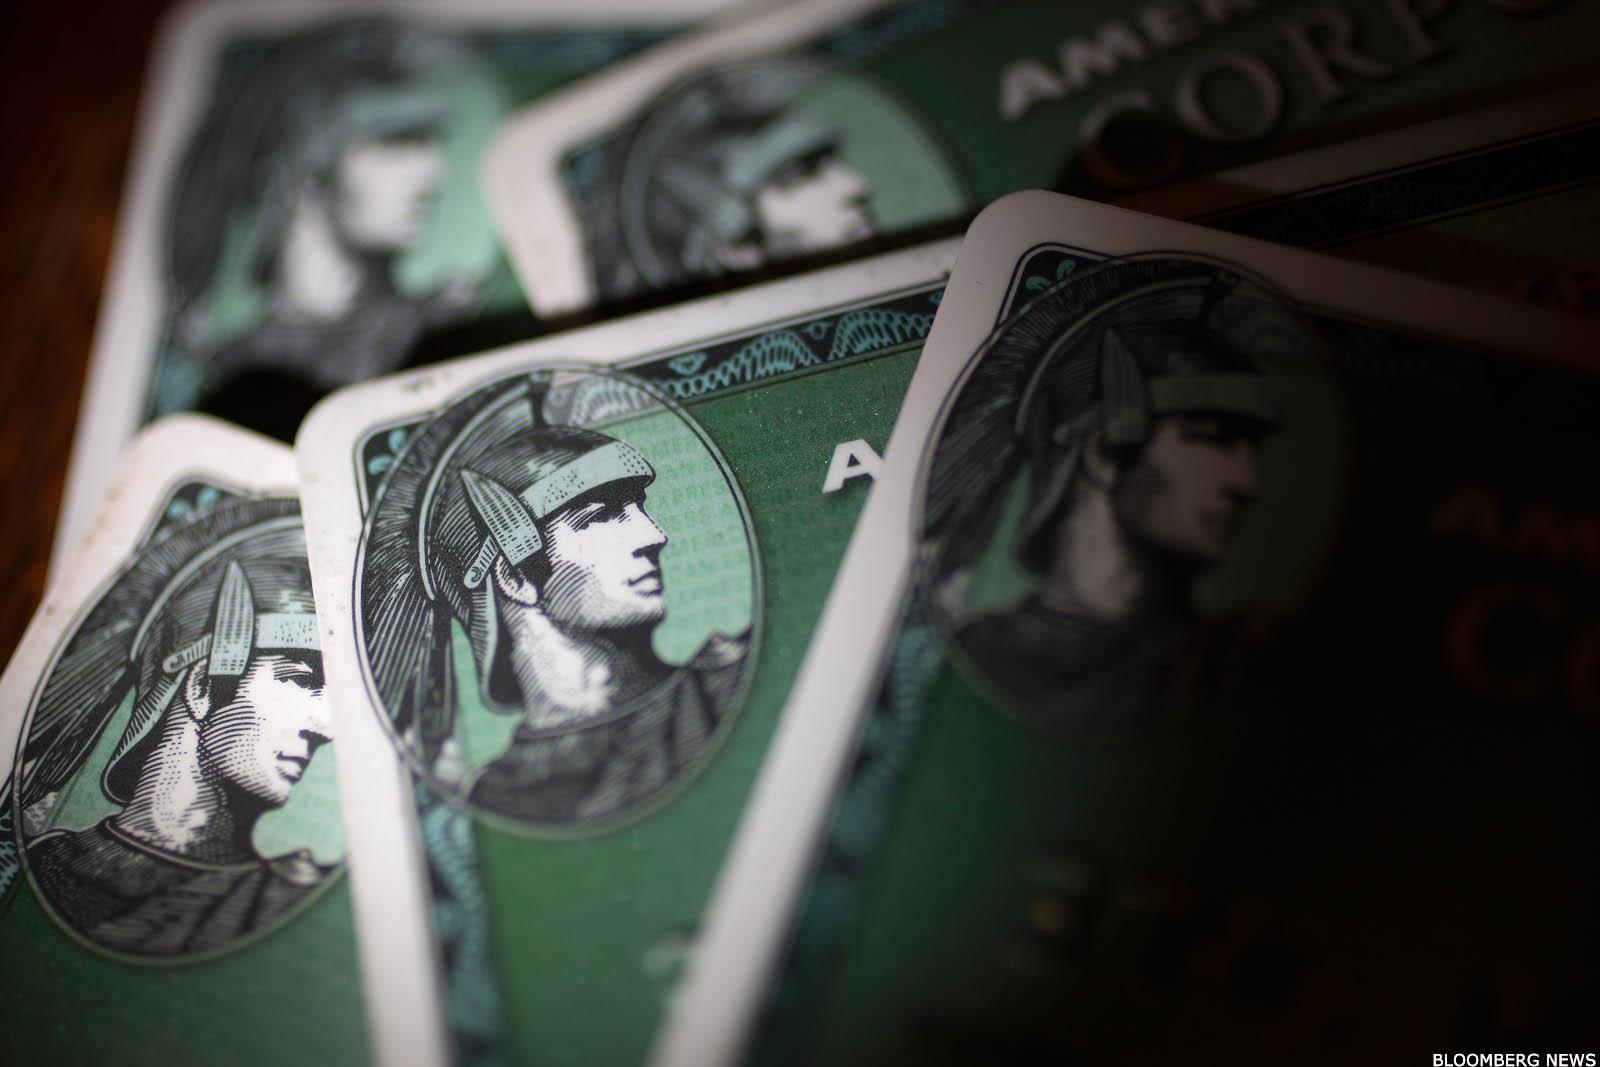 Warren Buffett Gives Retiring American Express CEO Two